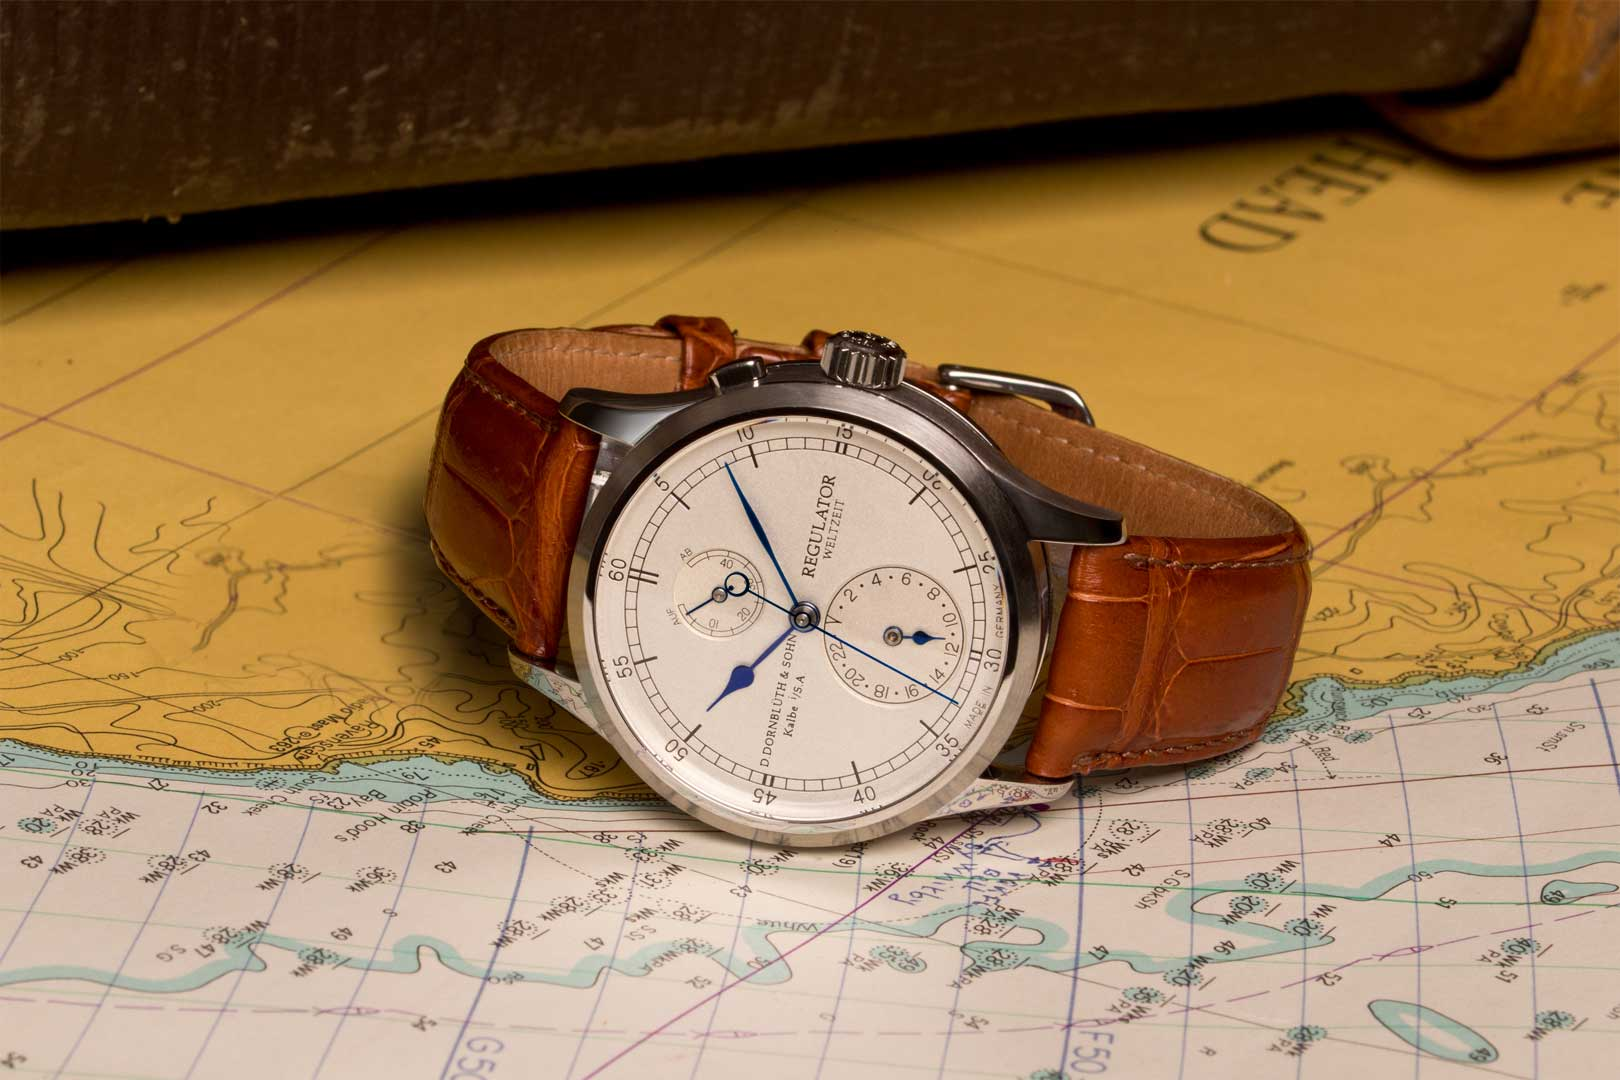 Dornbluth & Sohn - German watchmakers